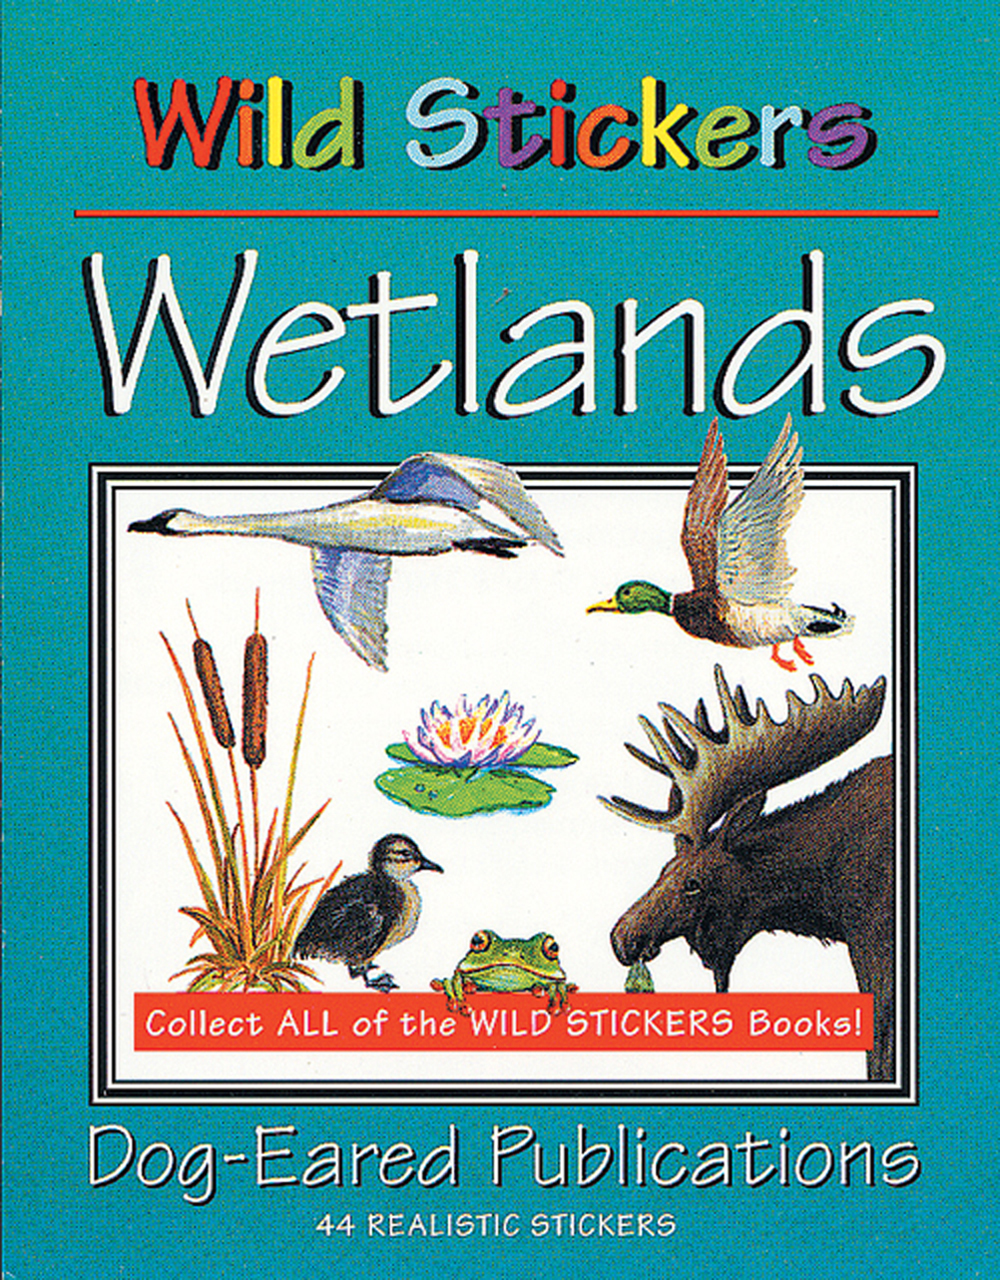 Wetlands (Wild Stickers Series)